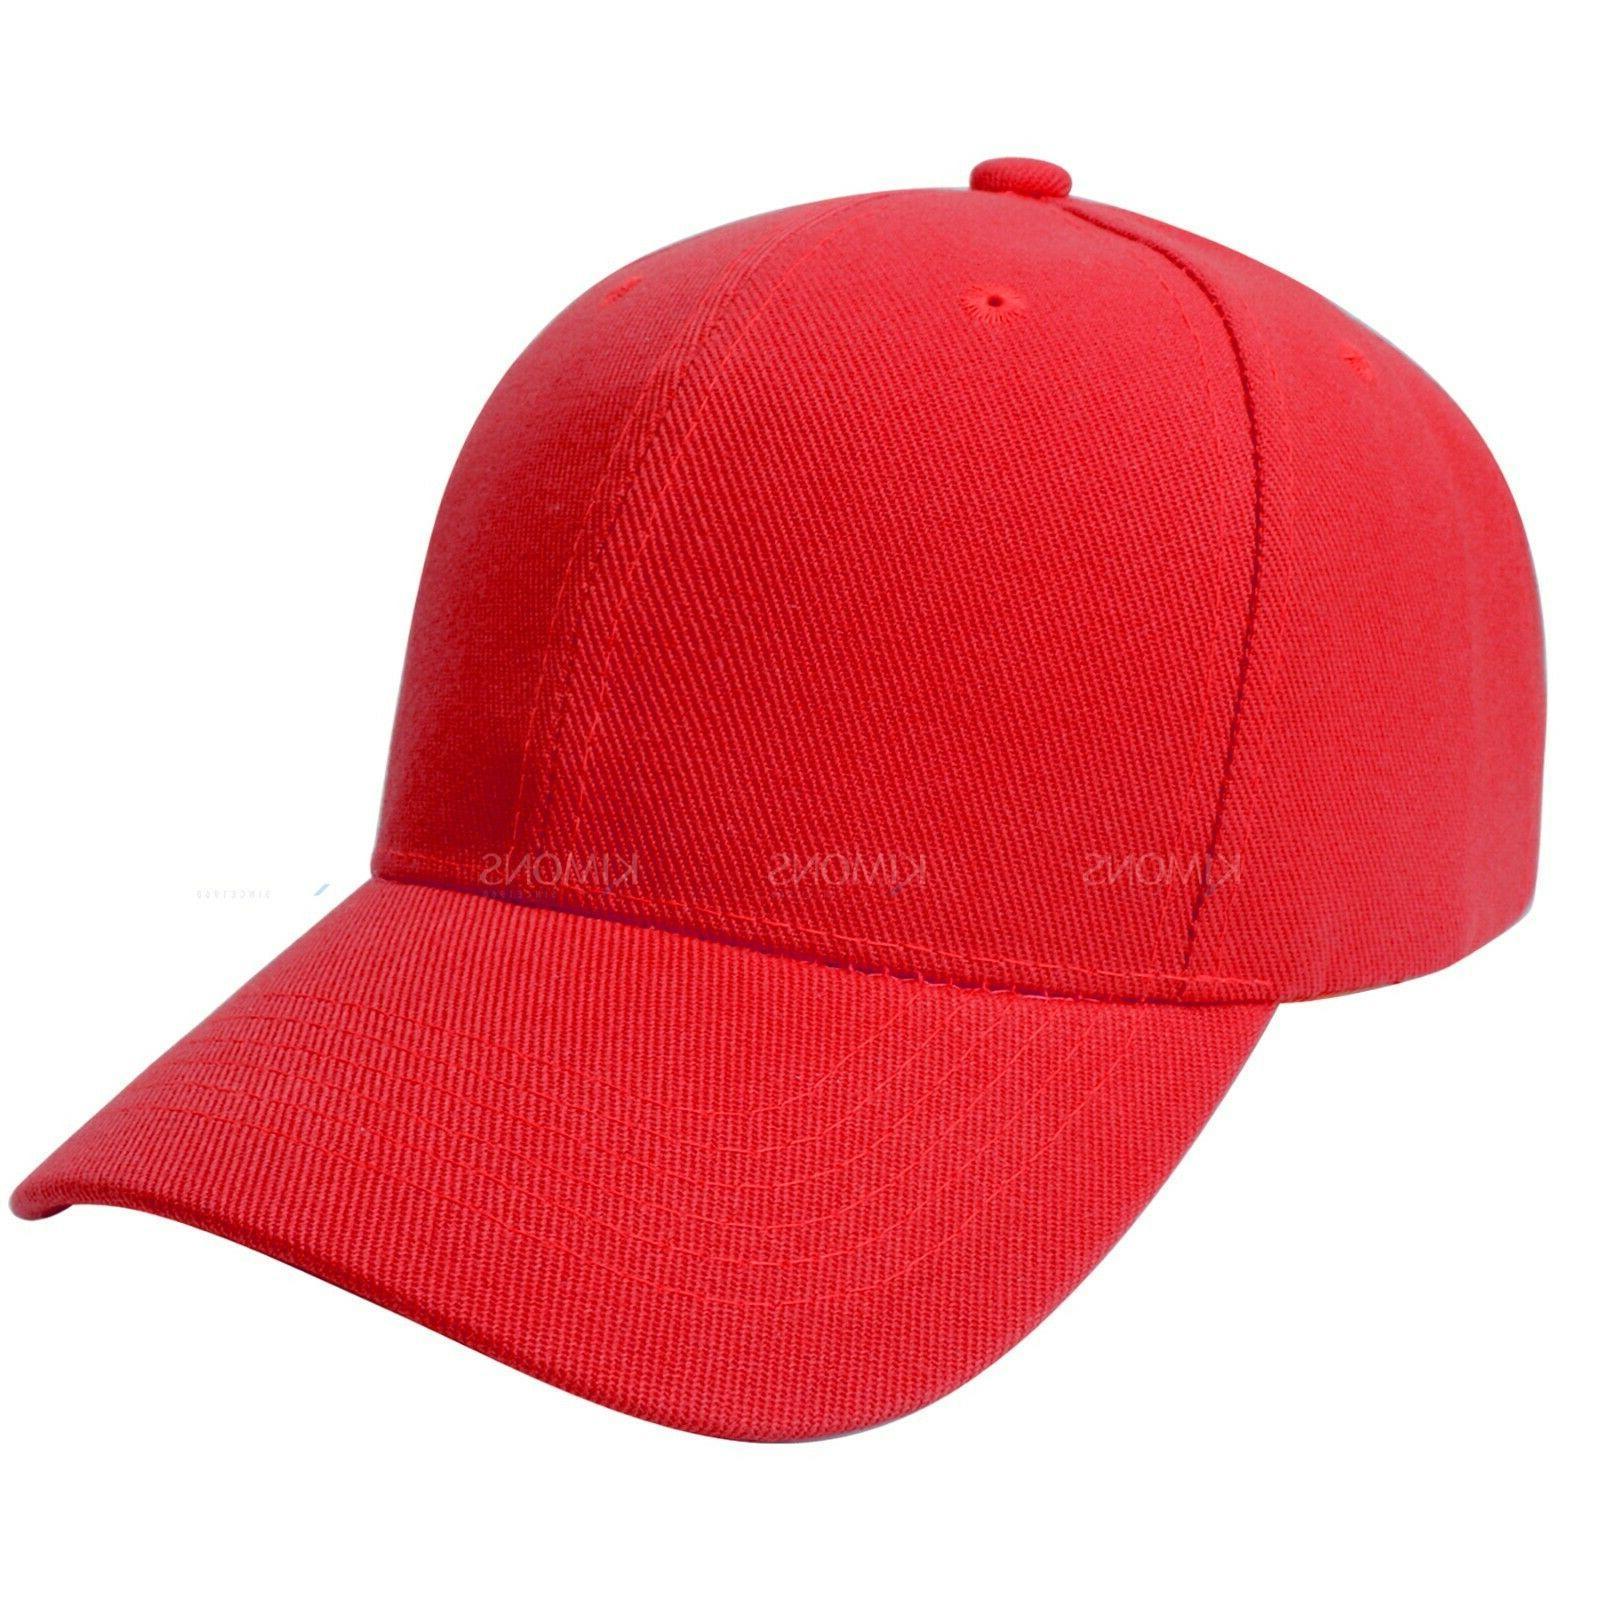 Plain Solid Cap Trucker Army Hat Adjustable